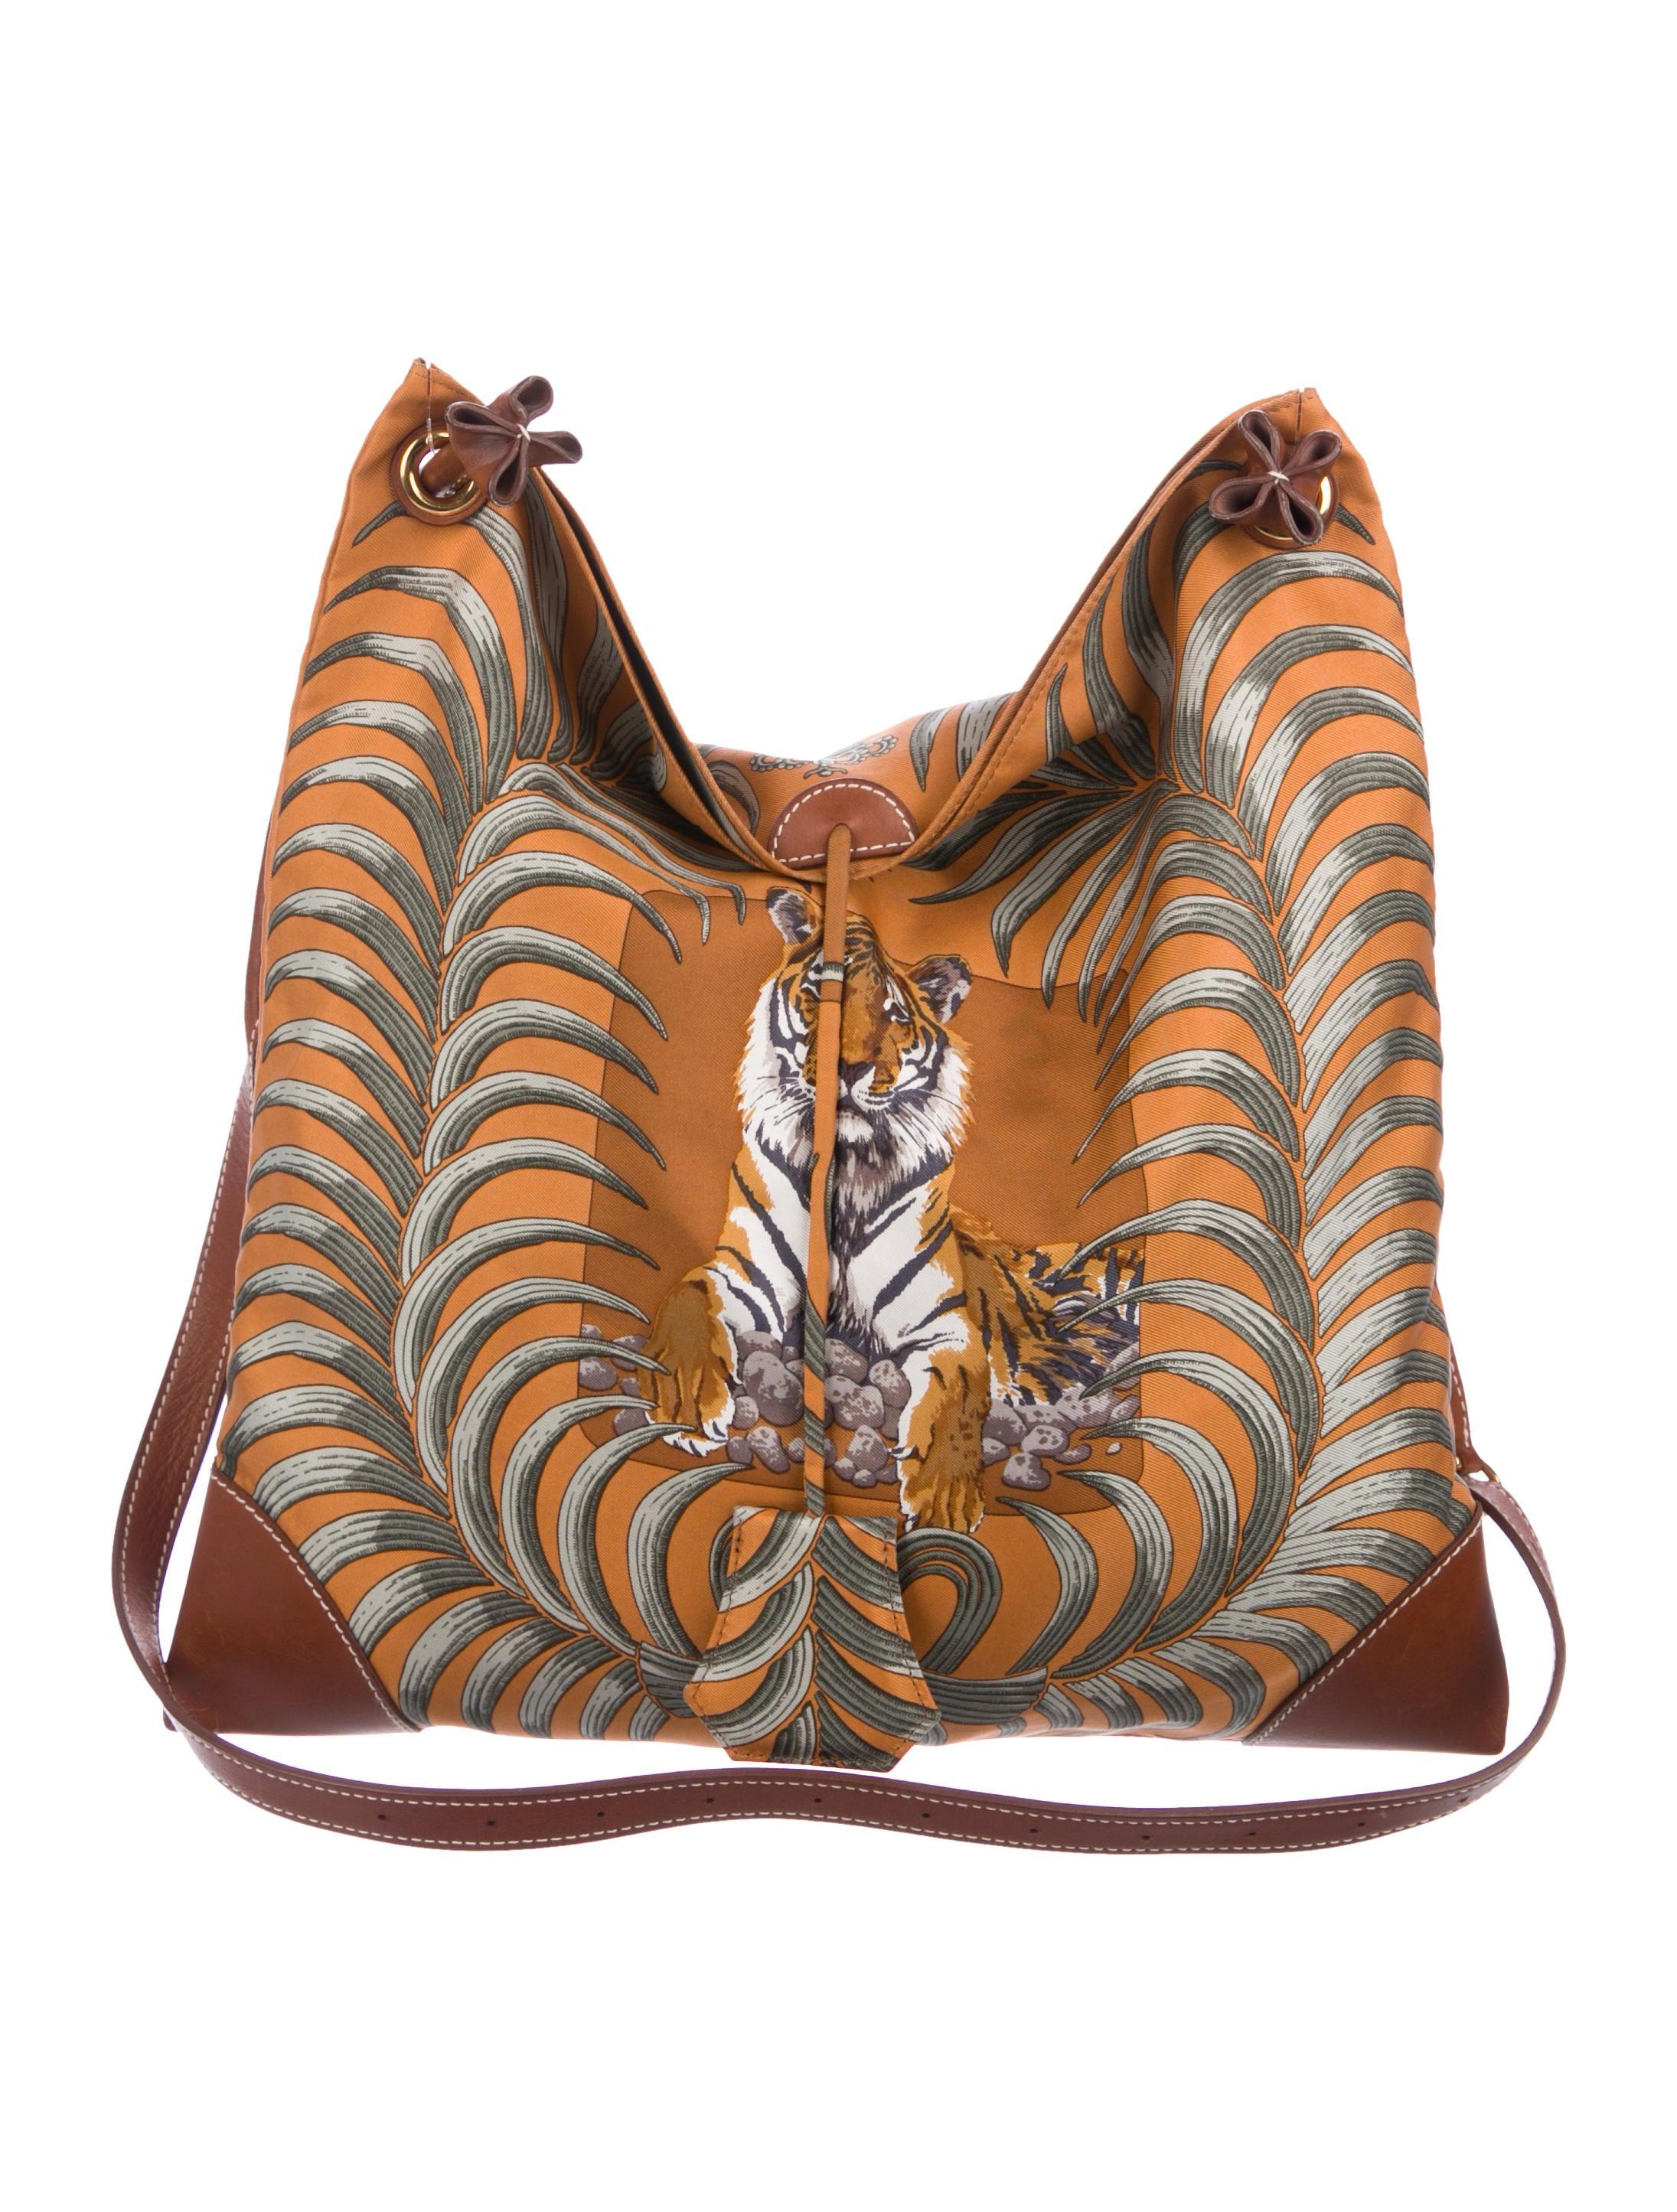 c0f9fbc48c1c Hermès Tigre Royale Silky City Tote - Handbags - HER141192